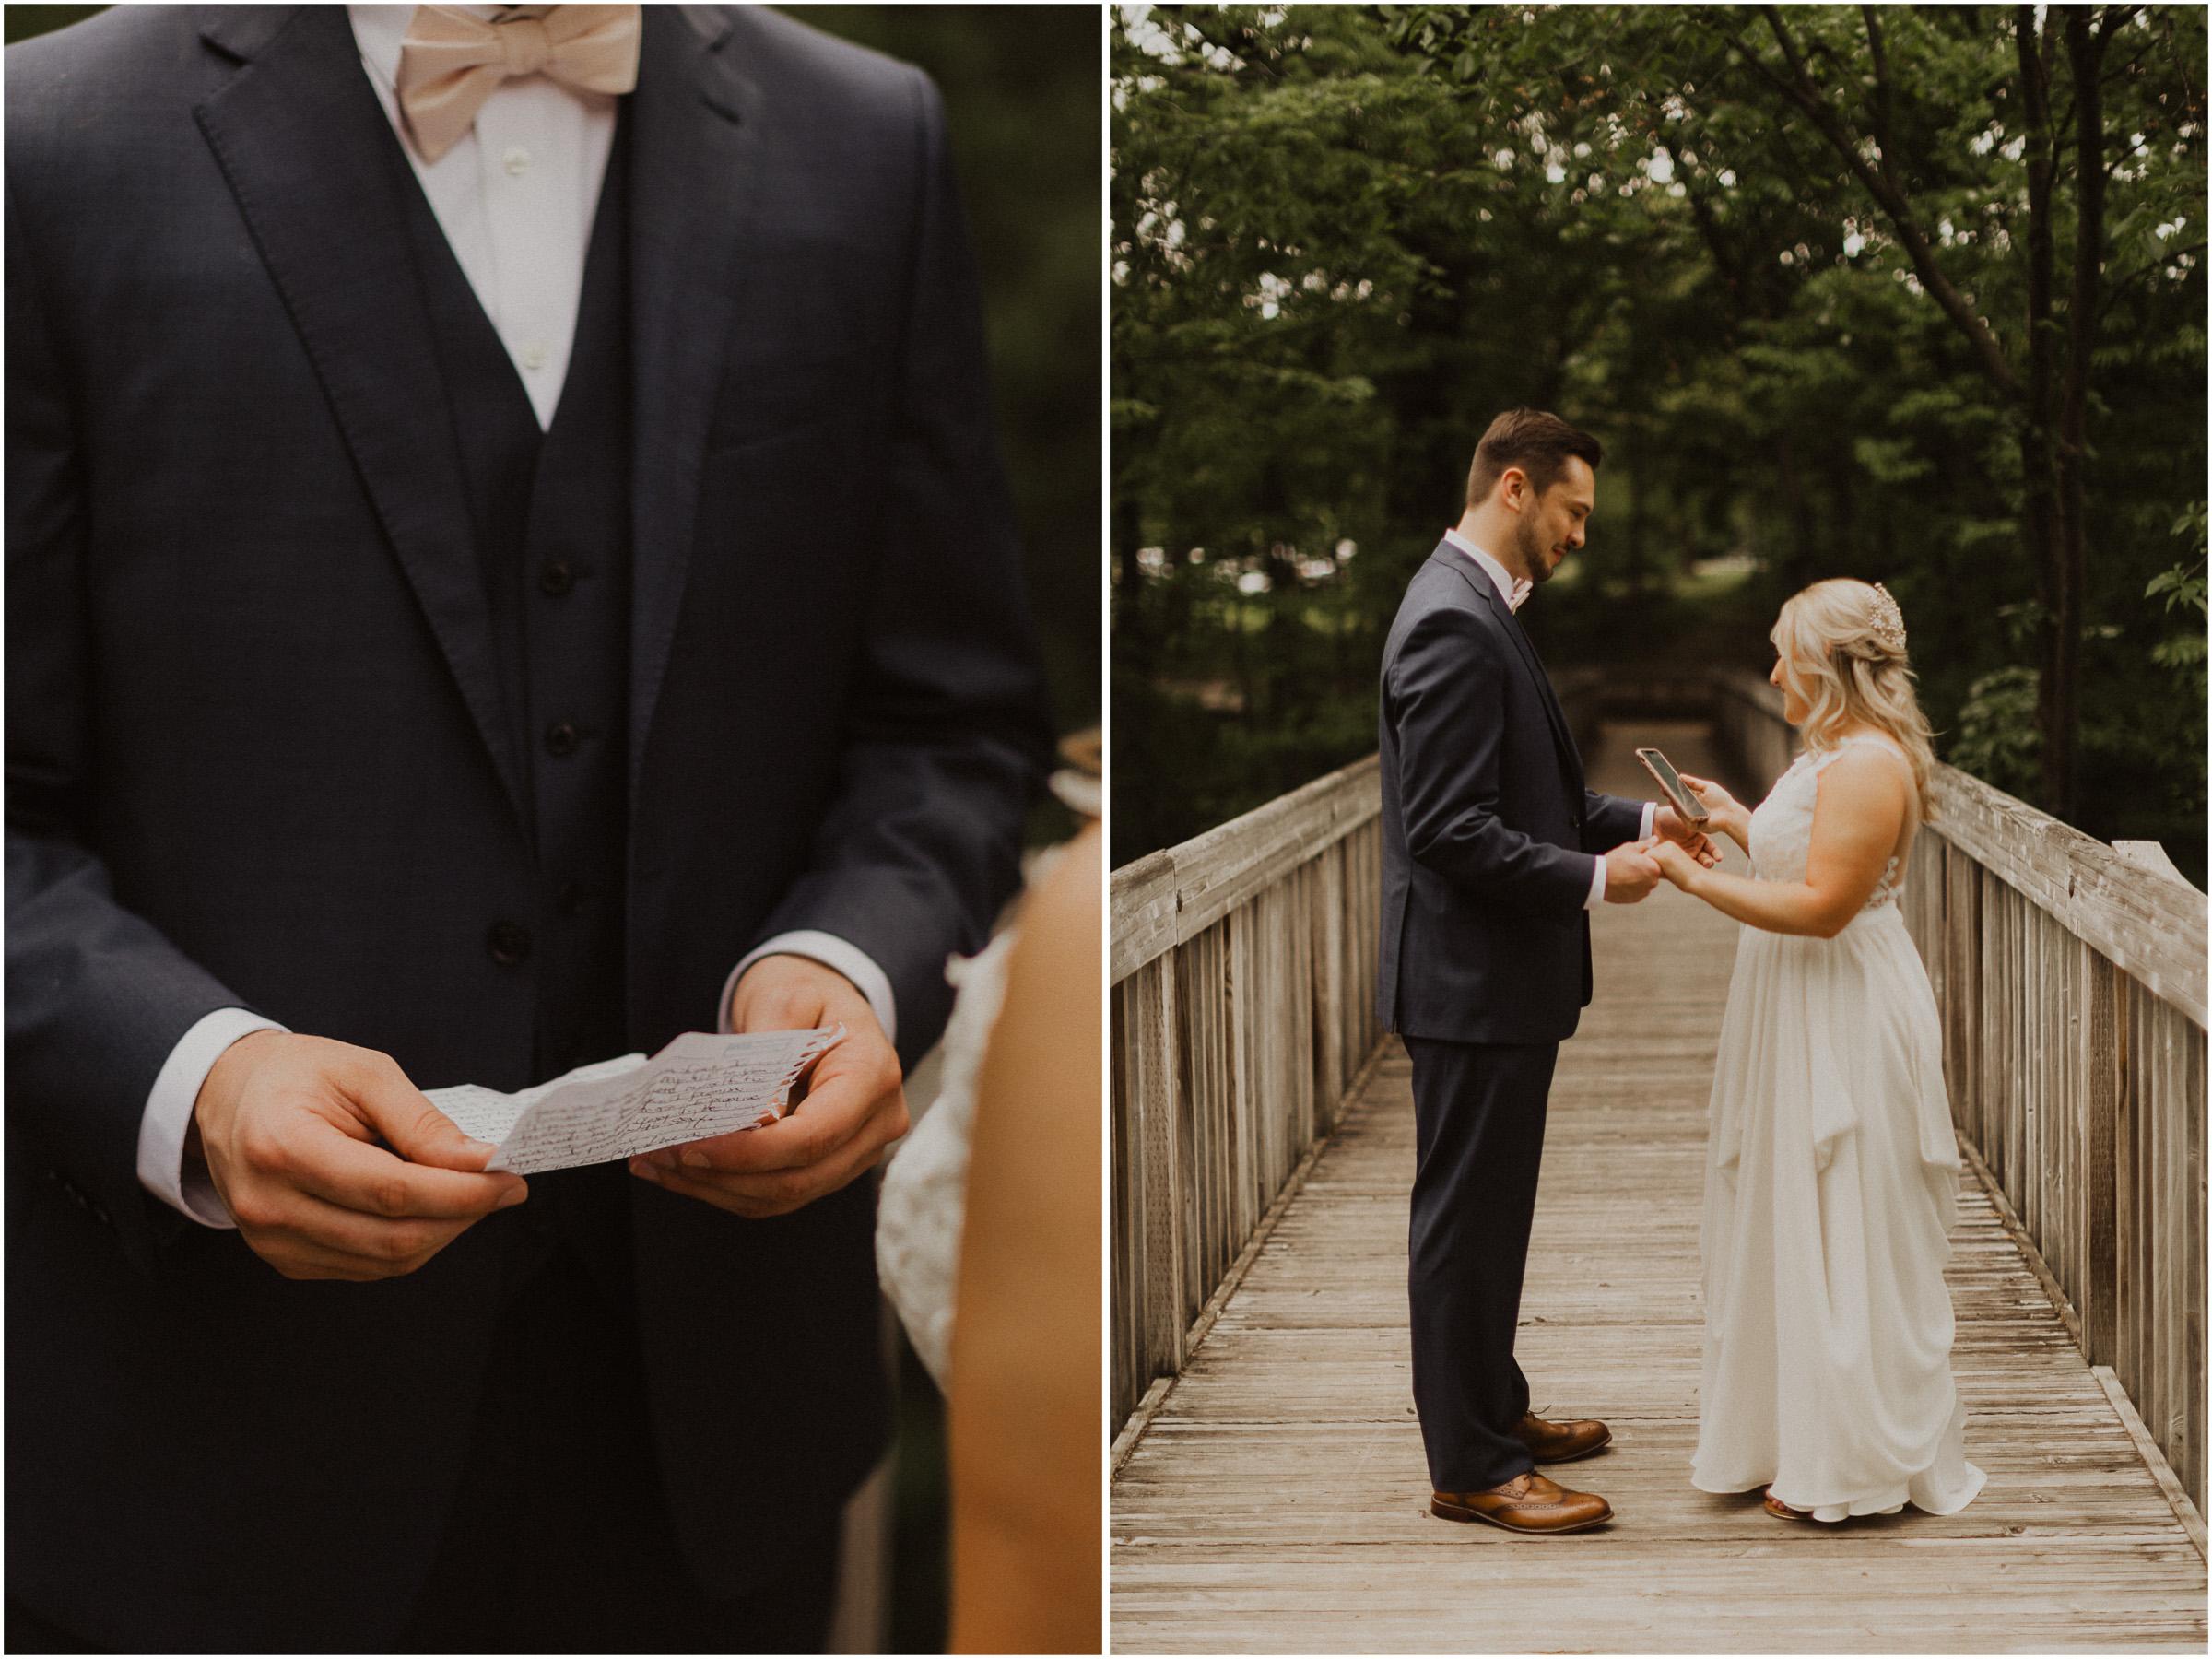 alyssa barletter photography nelson wedding nebraska city lied lodge morton barn spring wedding photographer-12.jpg